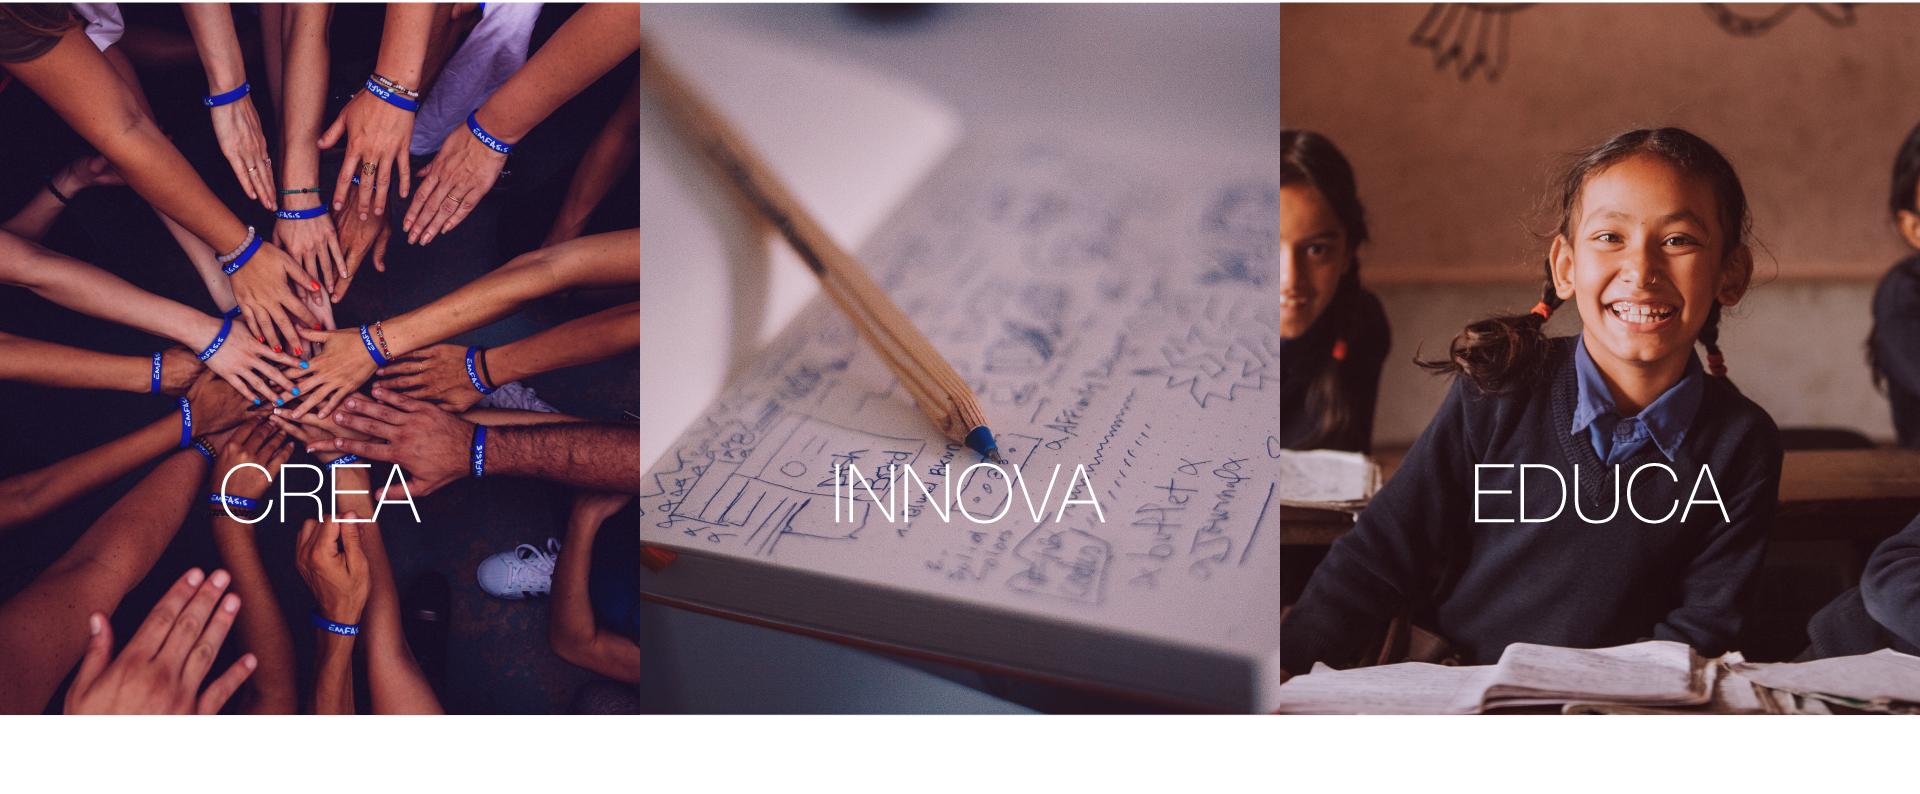 Crea Innova Educa AC